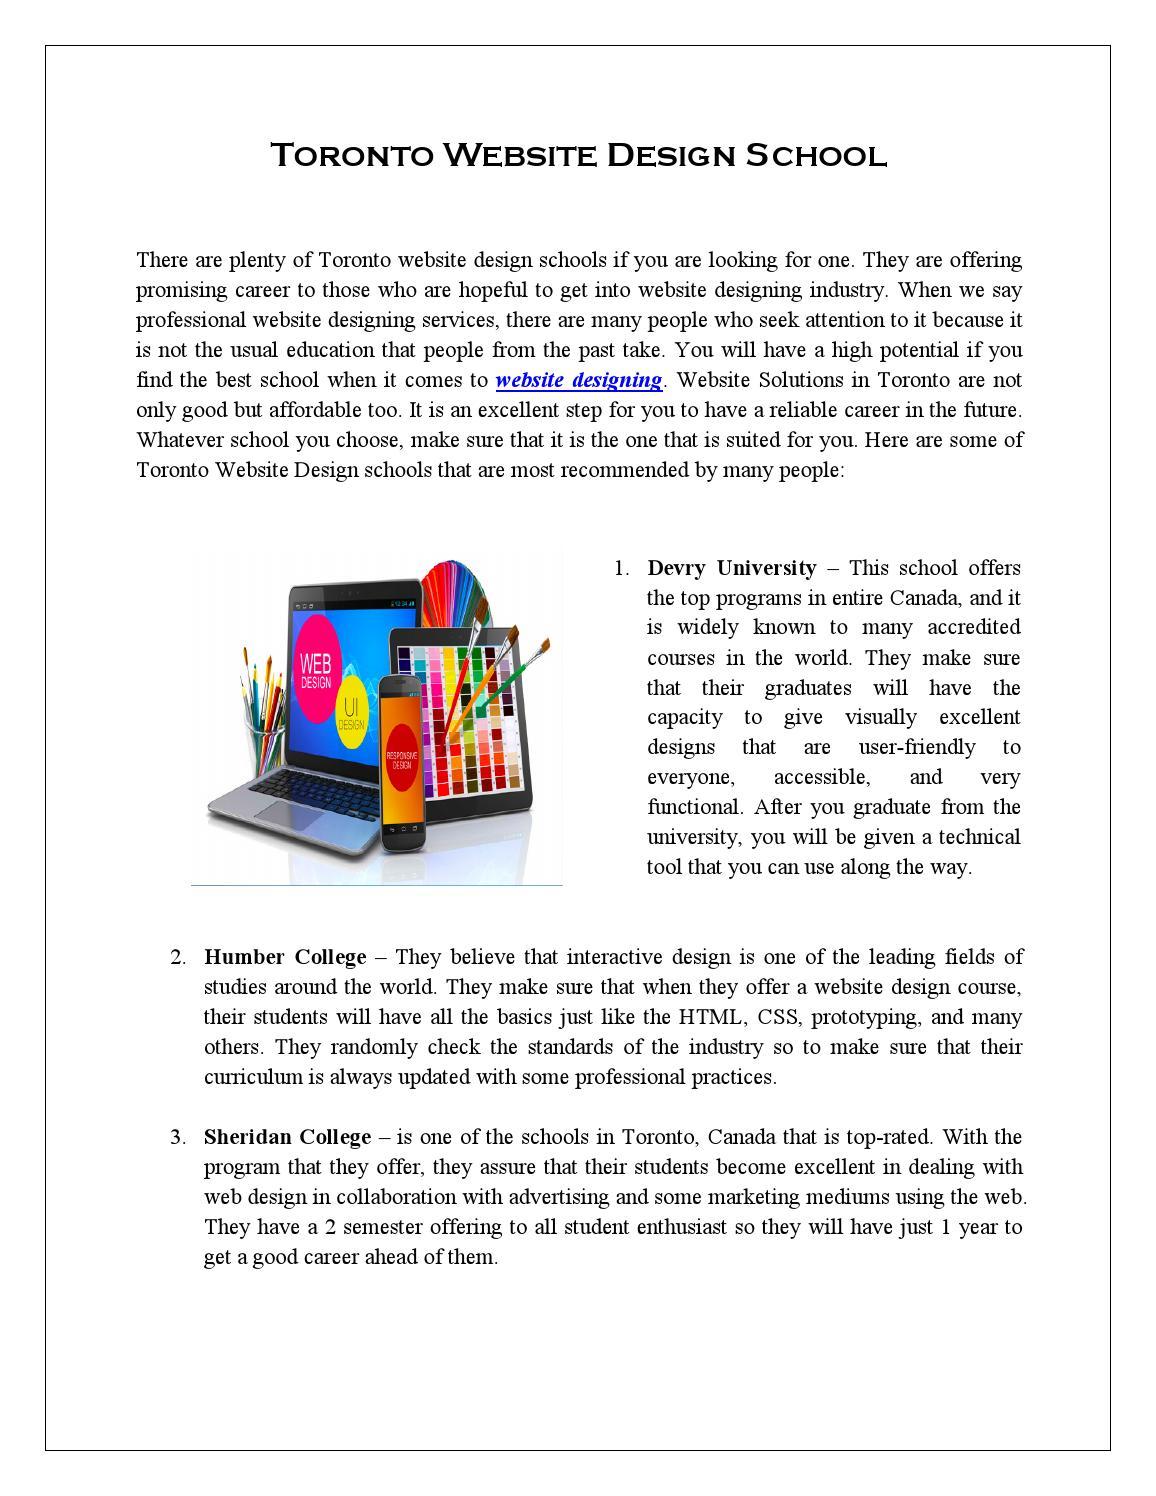 Toronto Website Design School By Accessomedia Issuu